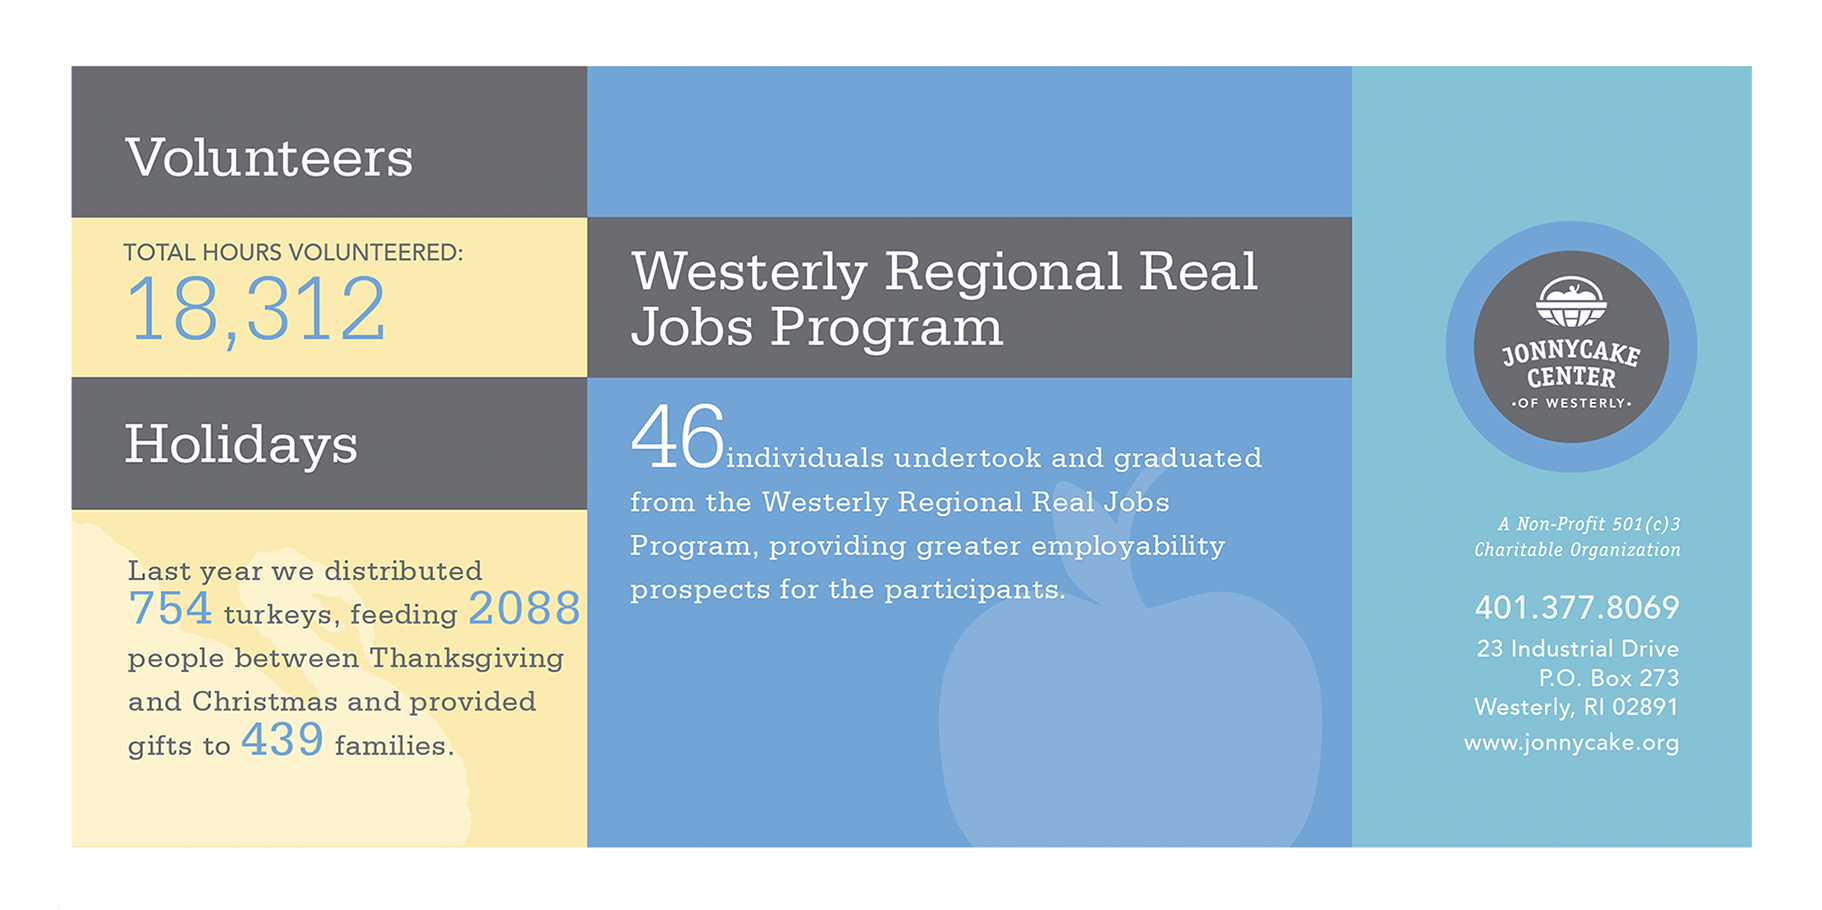 Jonnycake 2019 Annual Report graphic